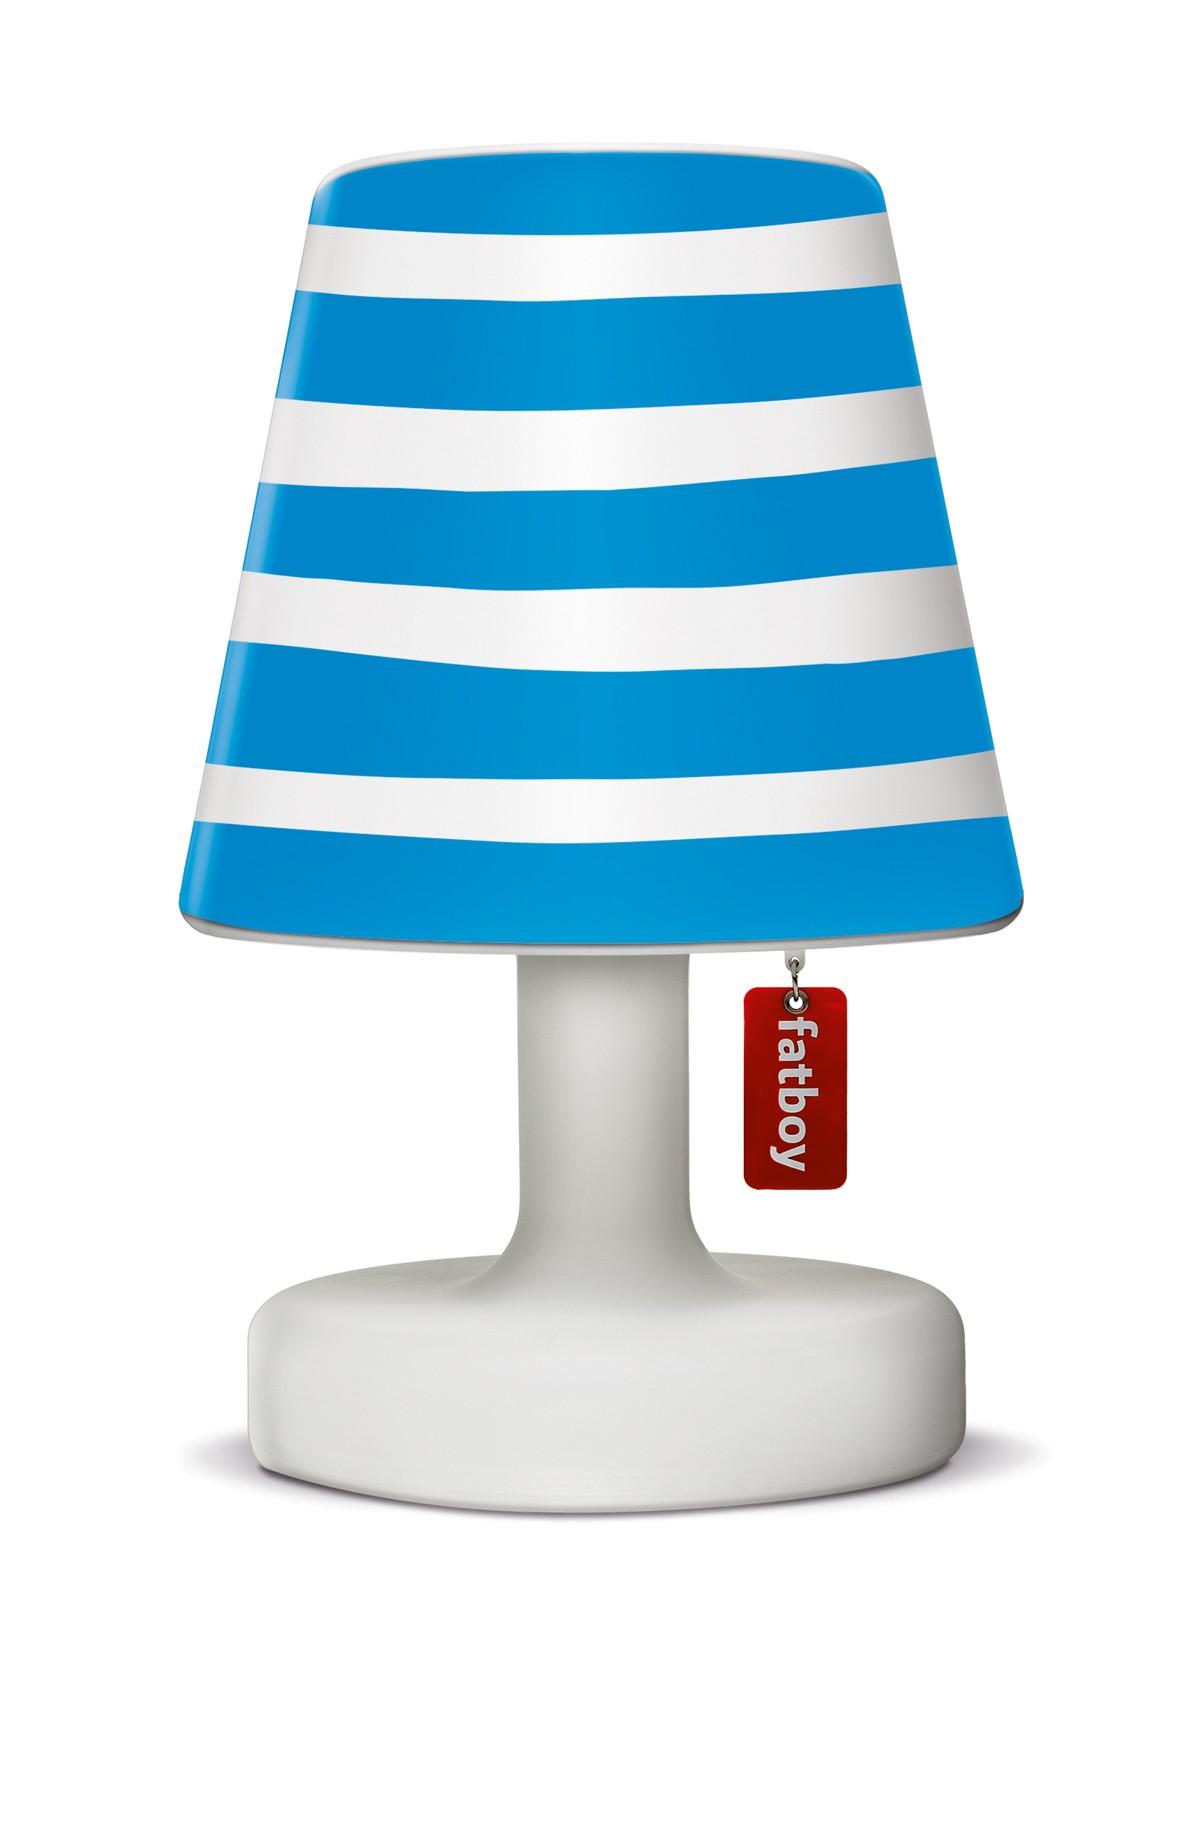 lampe edison the petit mr blue de fatboy. Black Bedroom Furniture Sets. Home Design Ideas